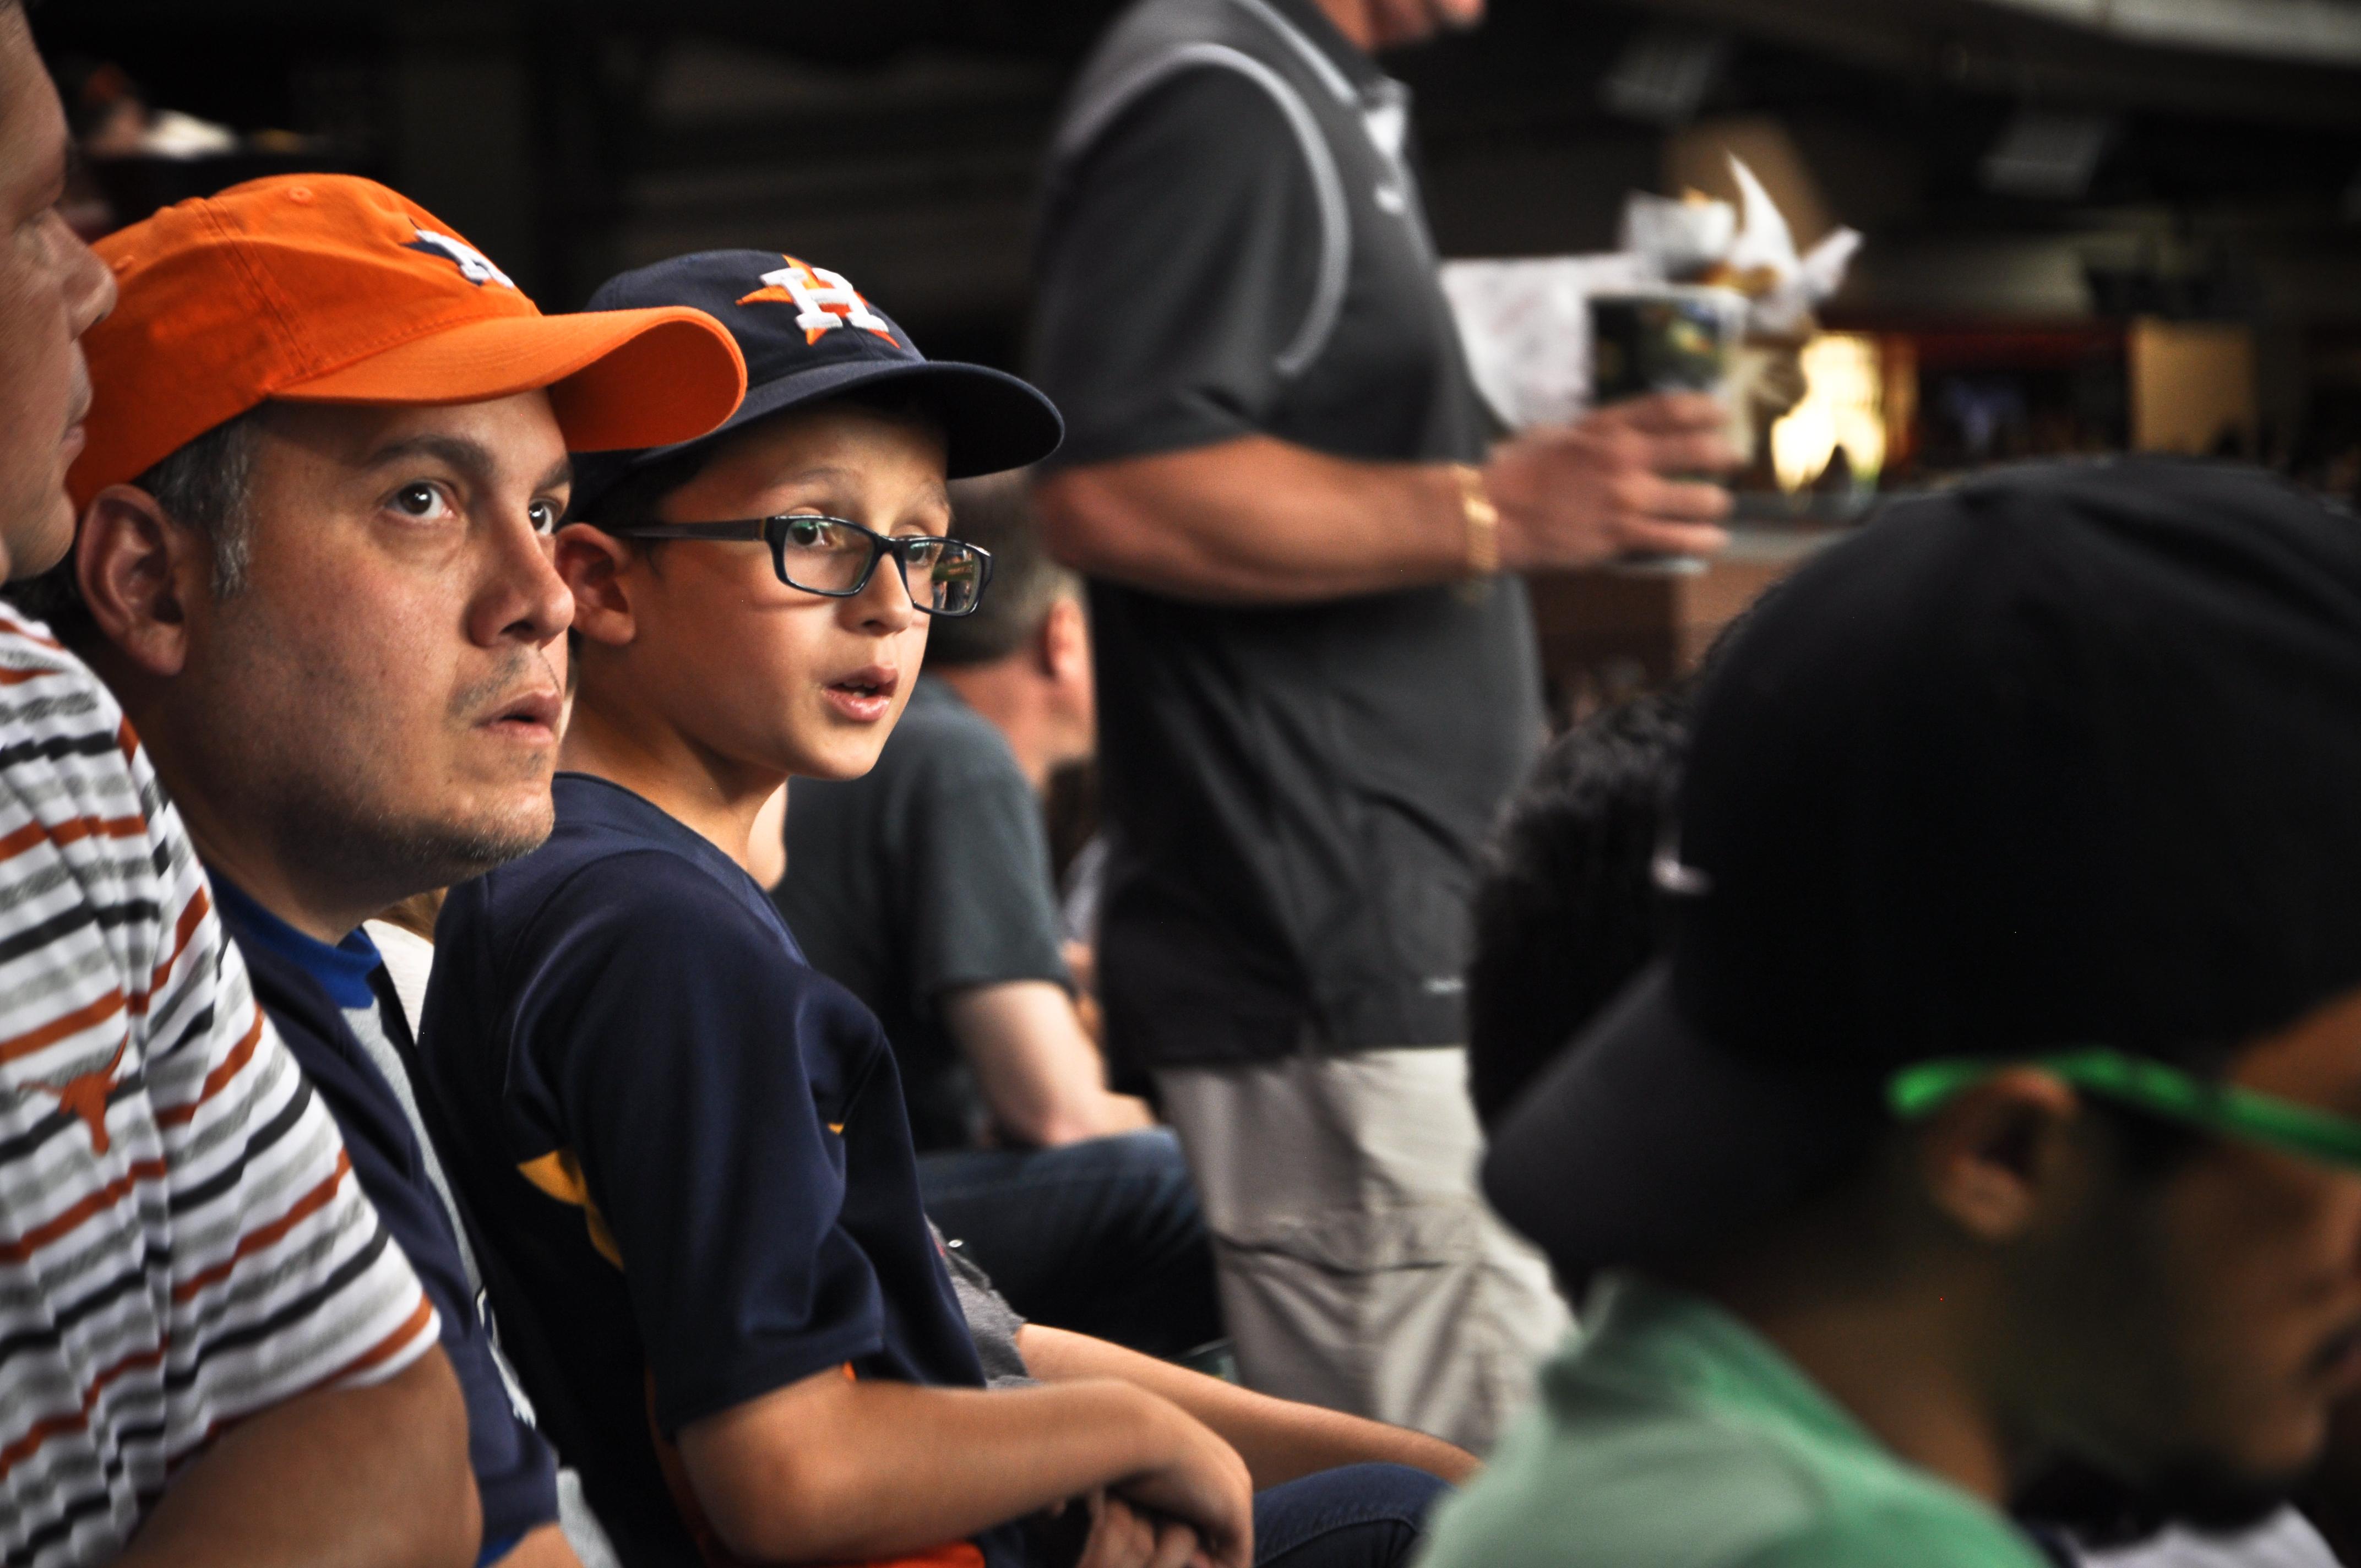 Texas Astros Fans in Crowd